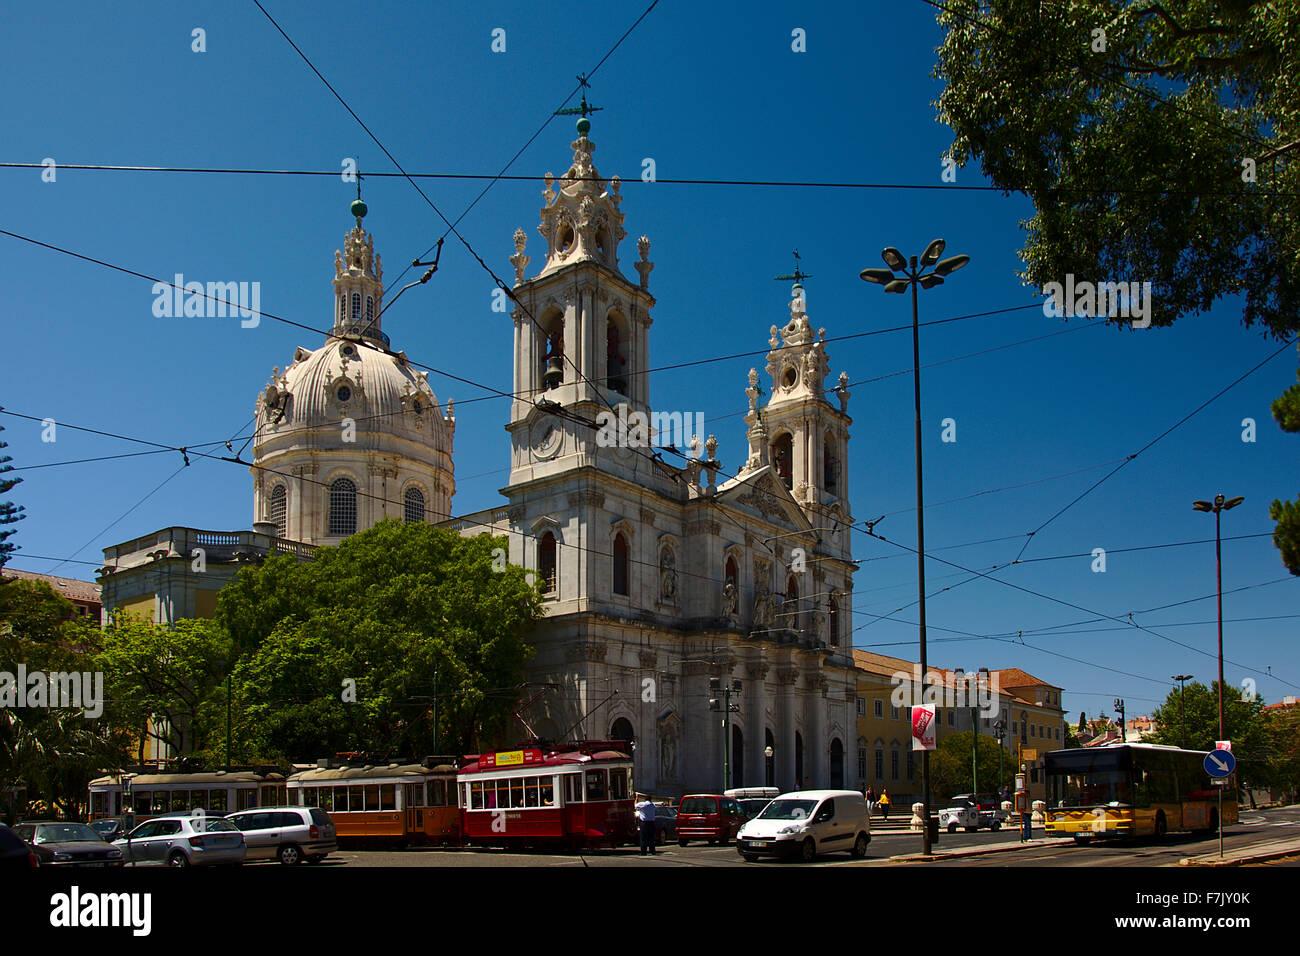 Trafic occupé autour de la basilique Estrela Photo Stock